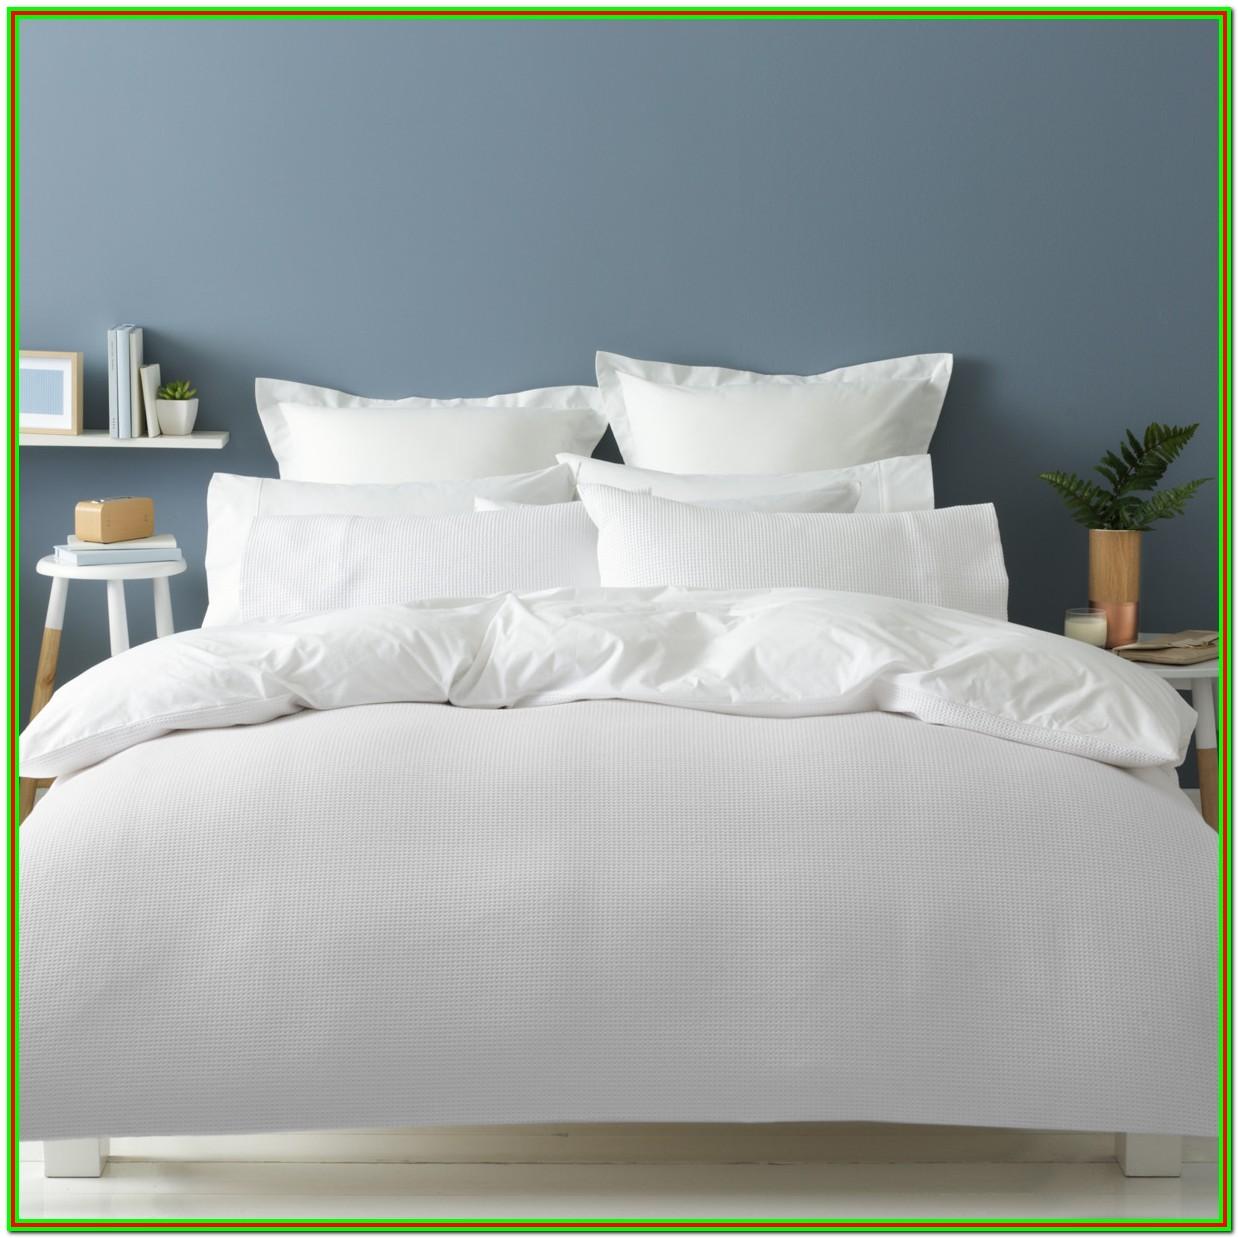 King Size Bed Sheets Kmart